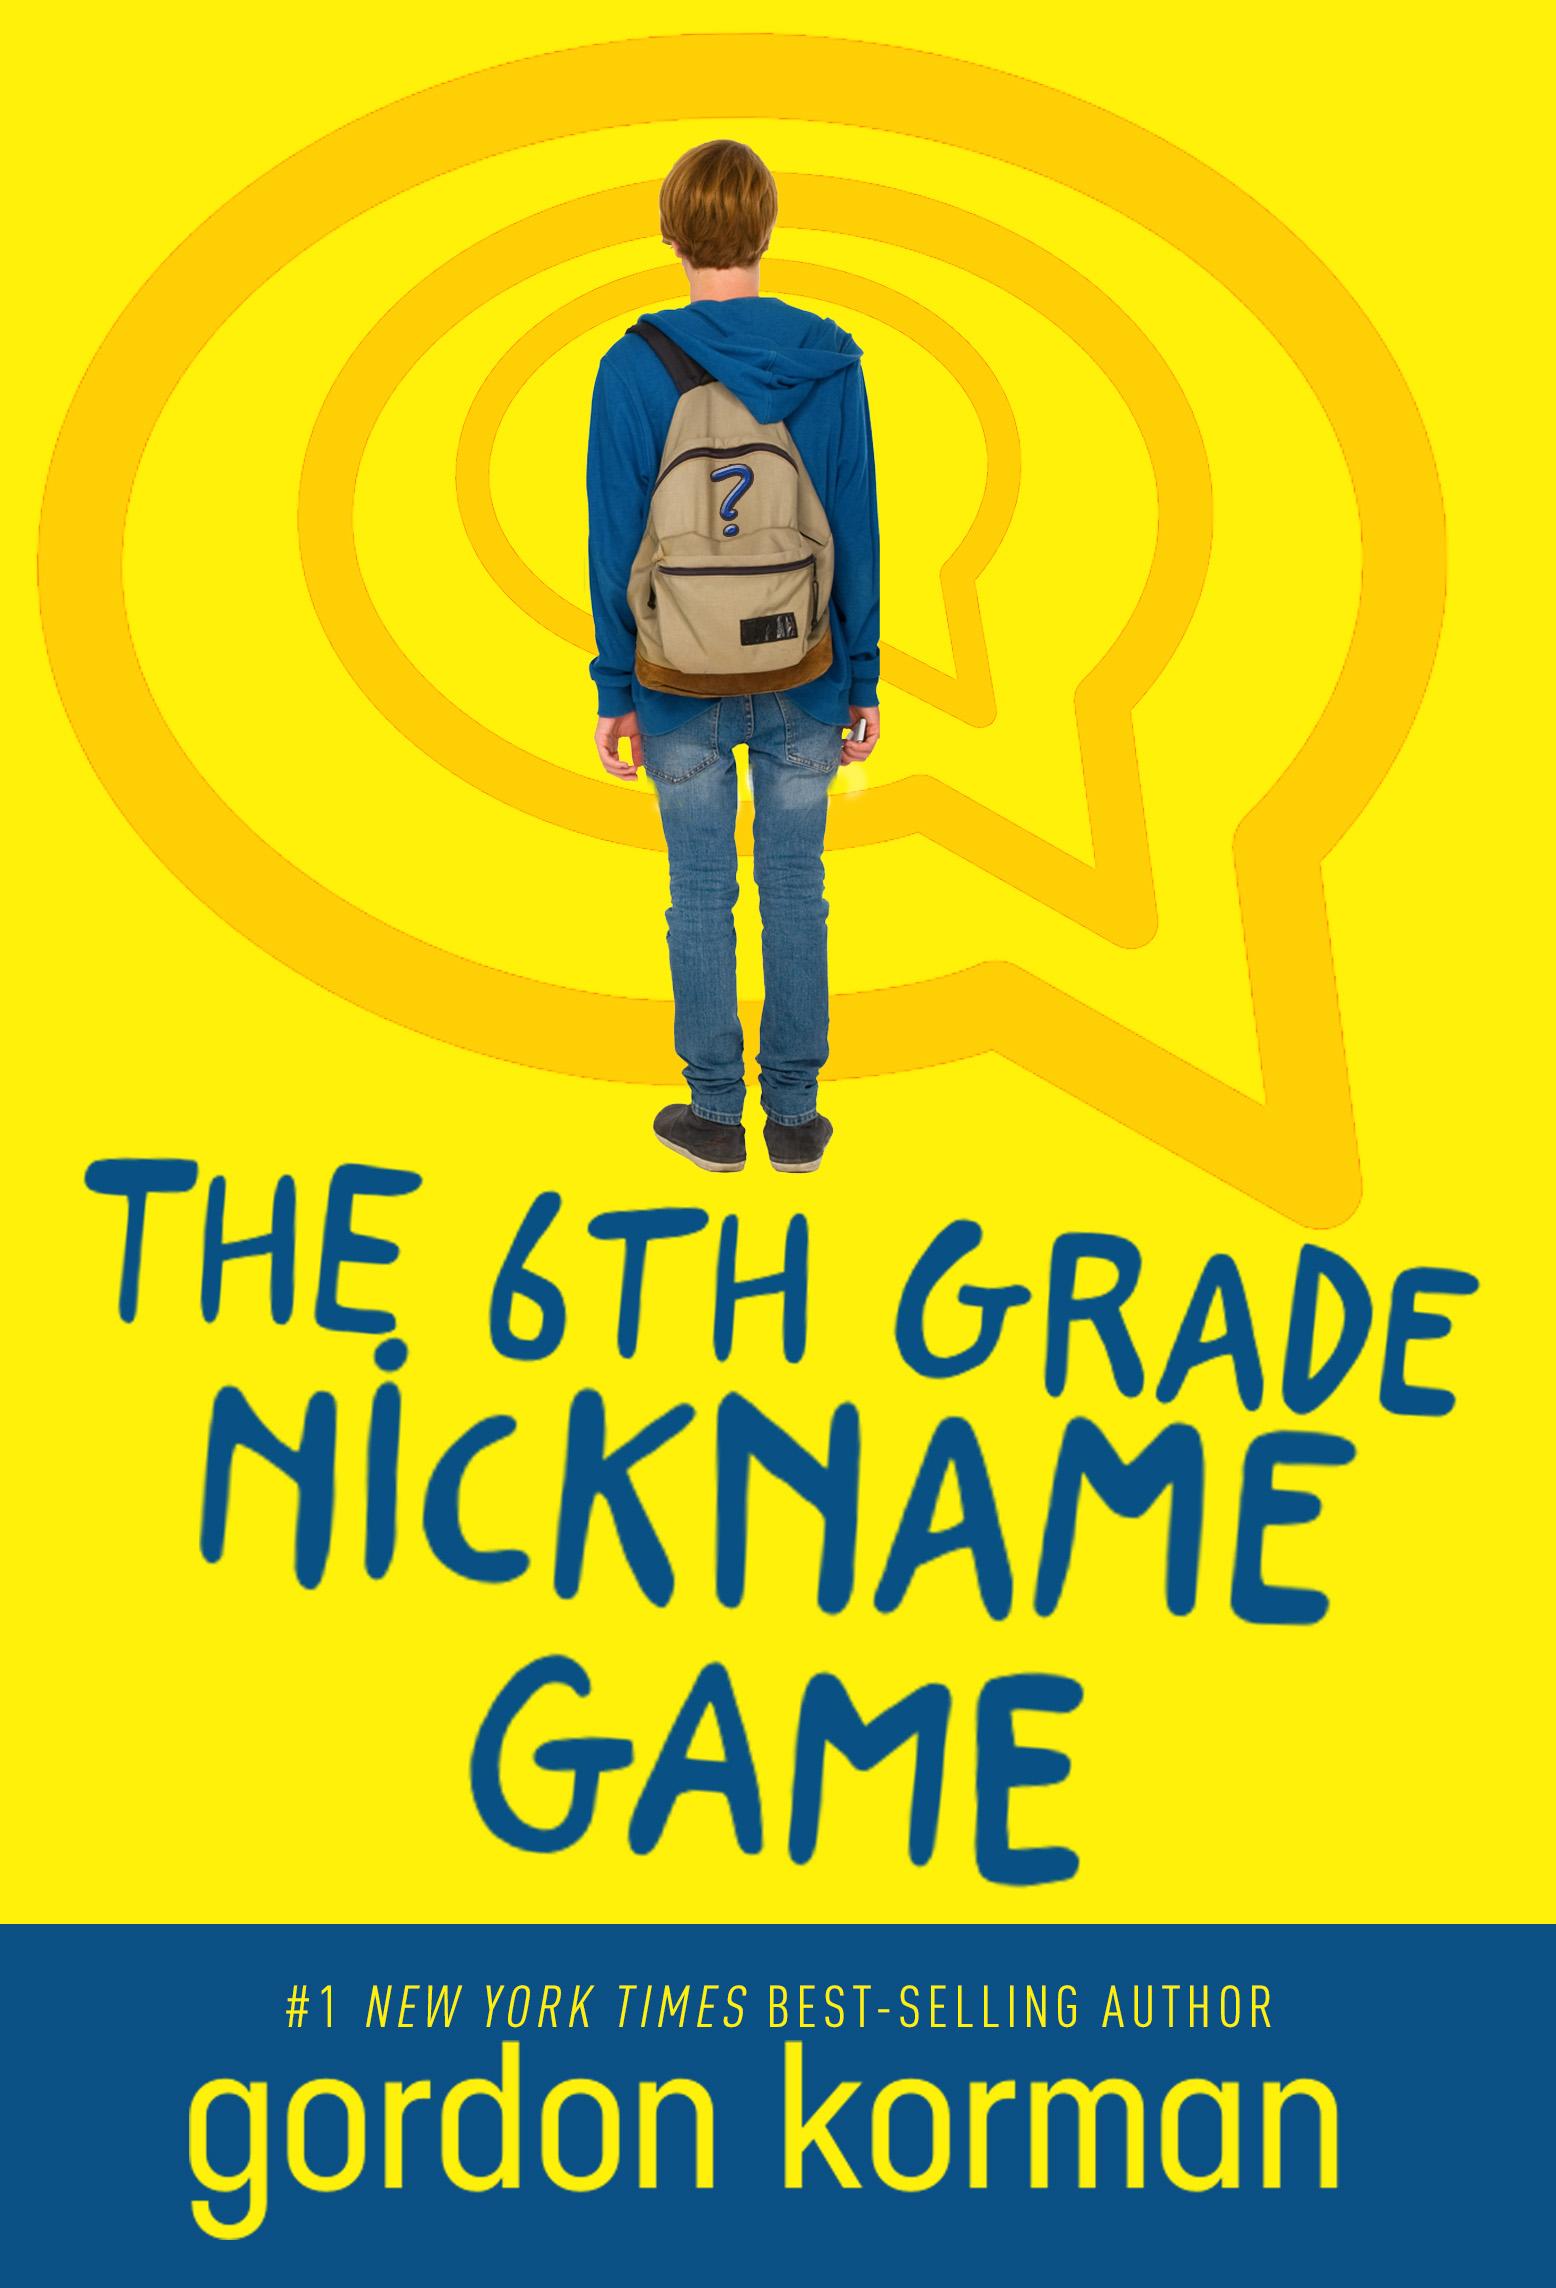 THE 6TH GRADE NICKNAME GAME « Gordon Korman